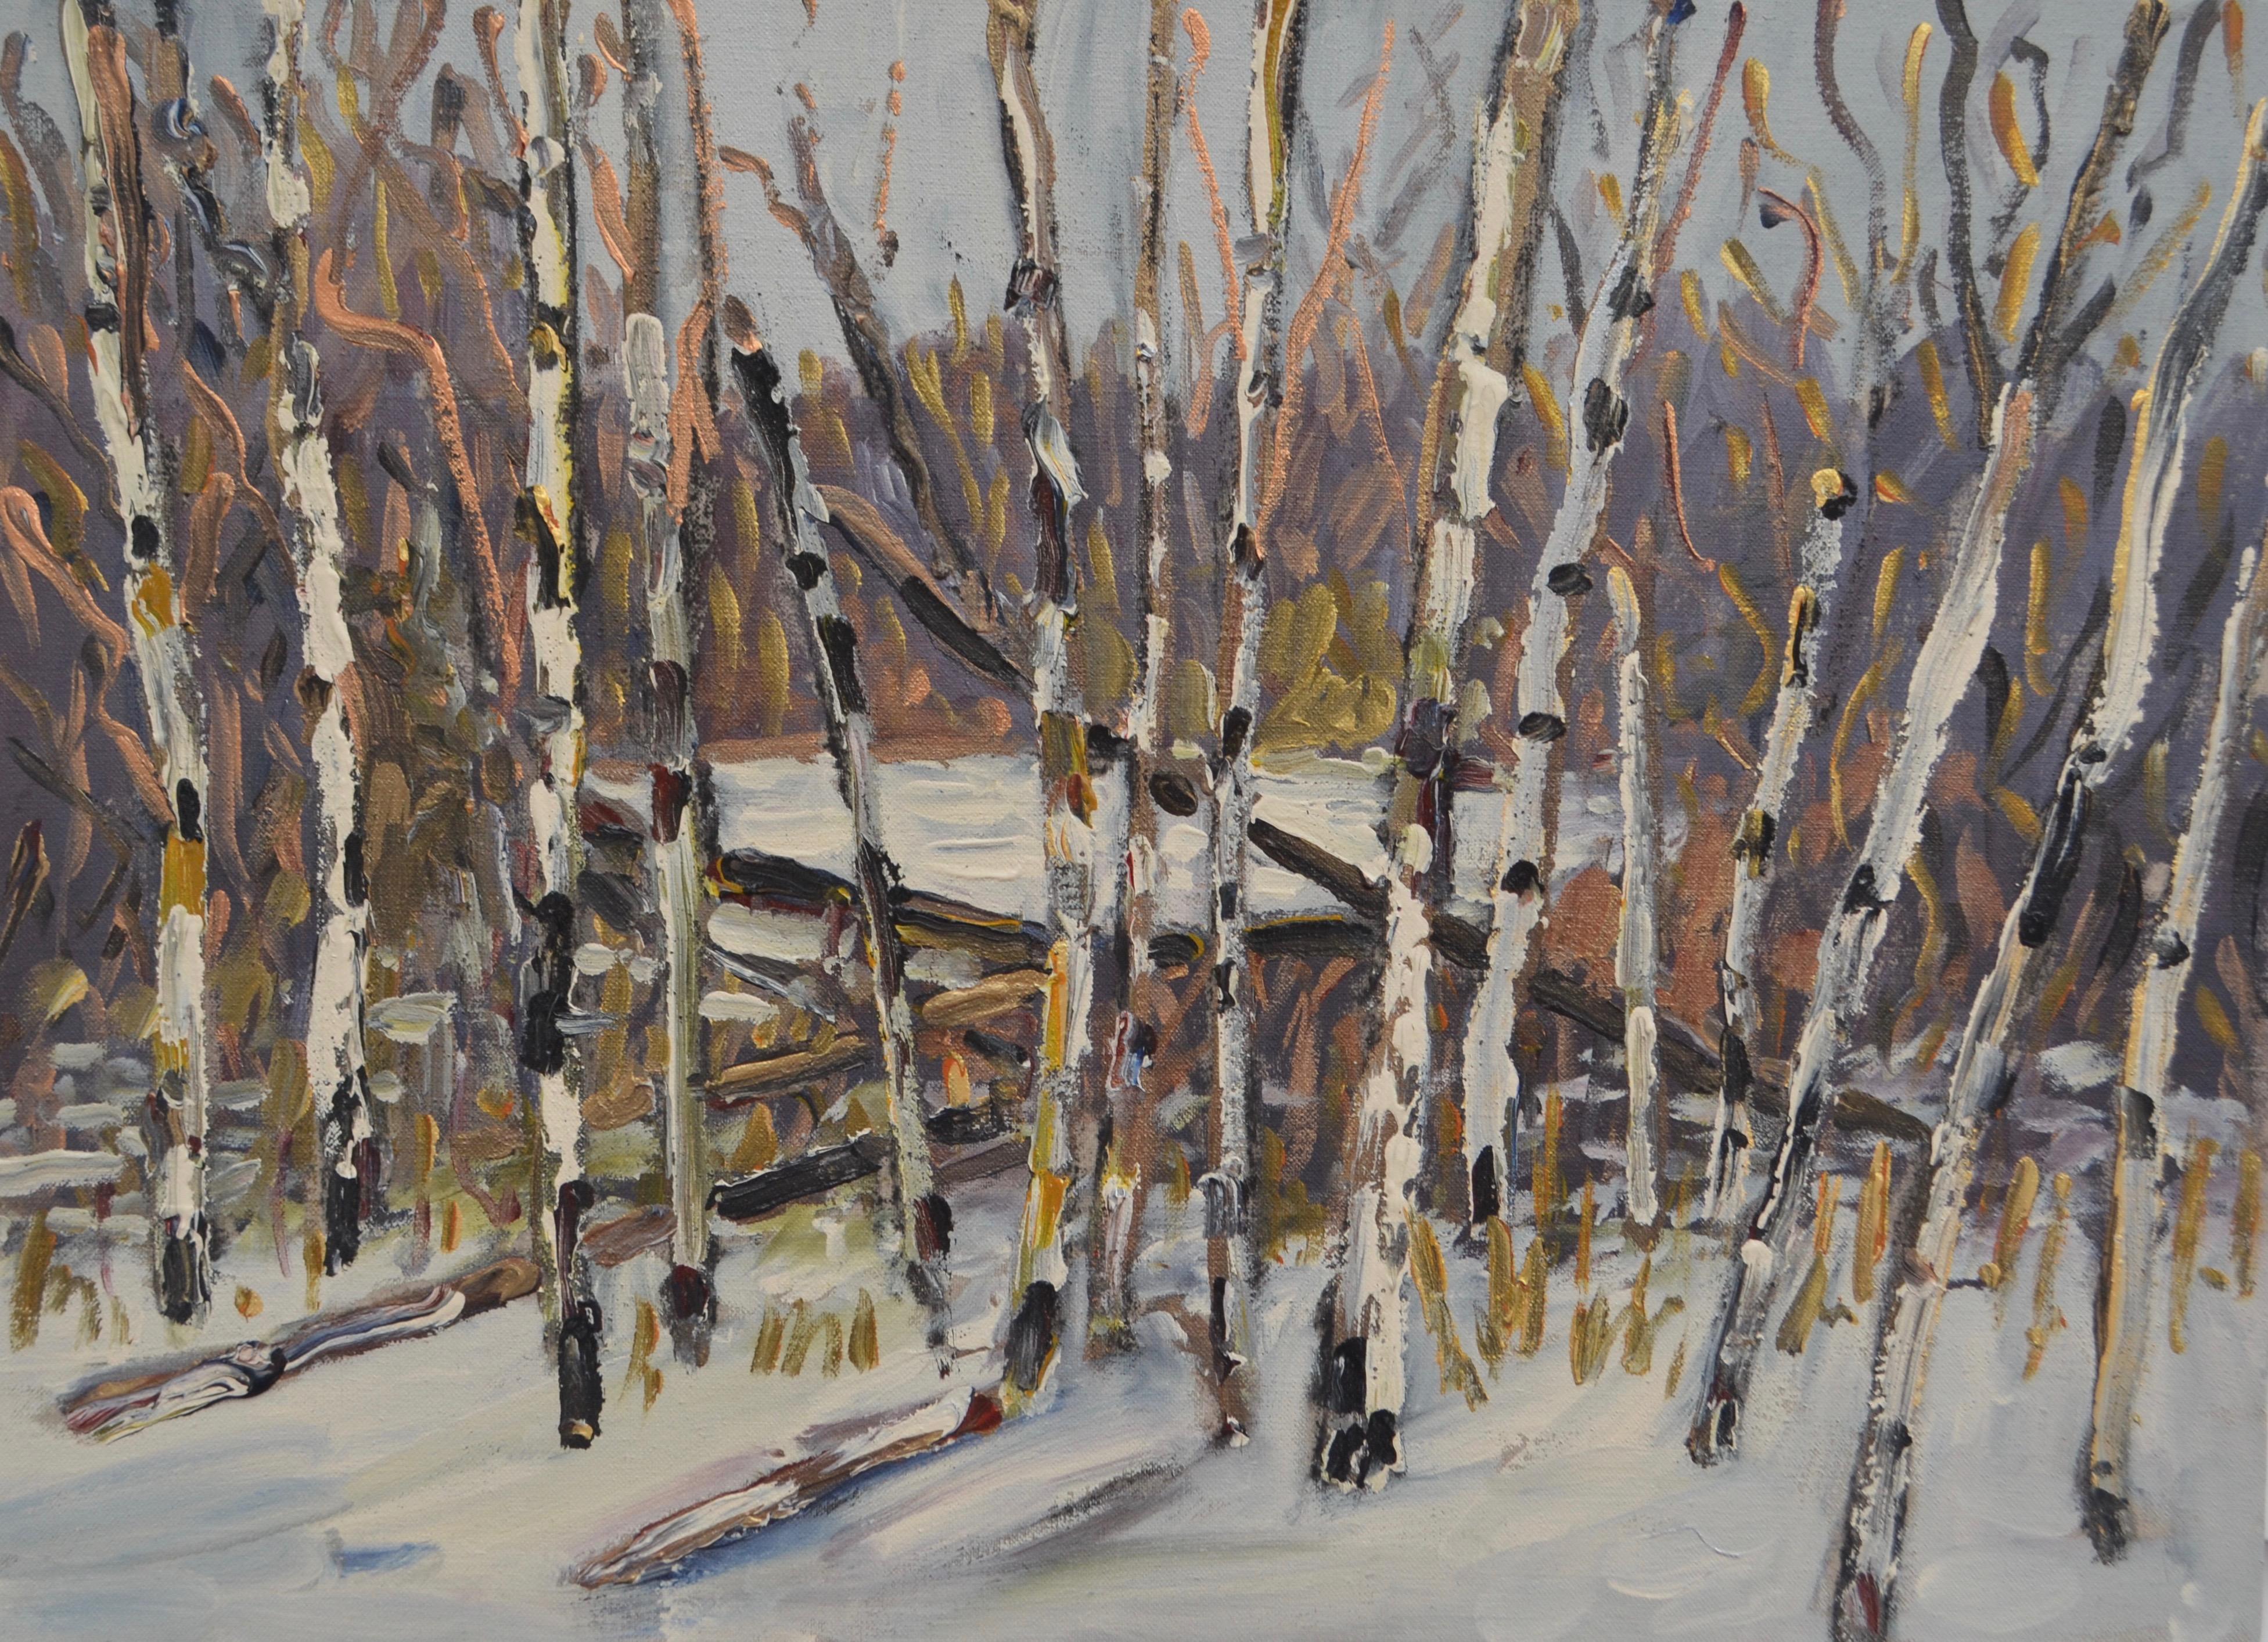 Poplars Snow and Willows 2017 acrylic on linen 22_ x 30_